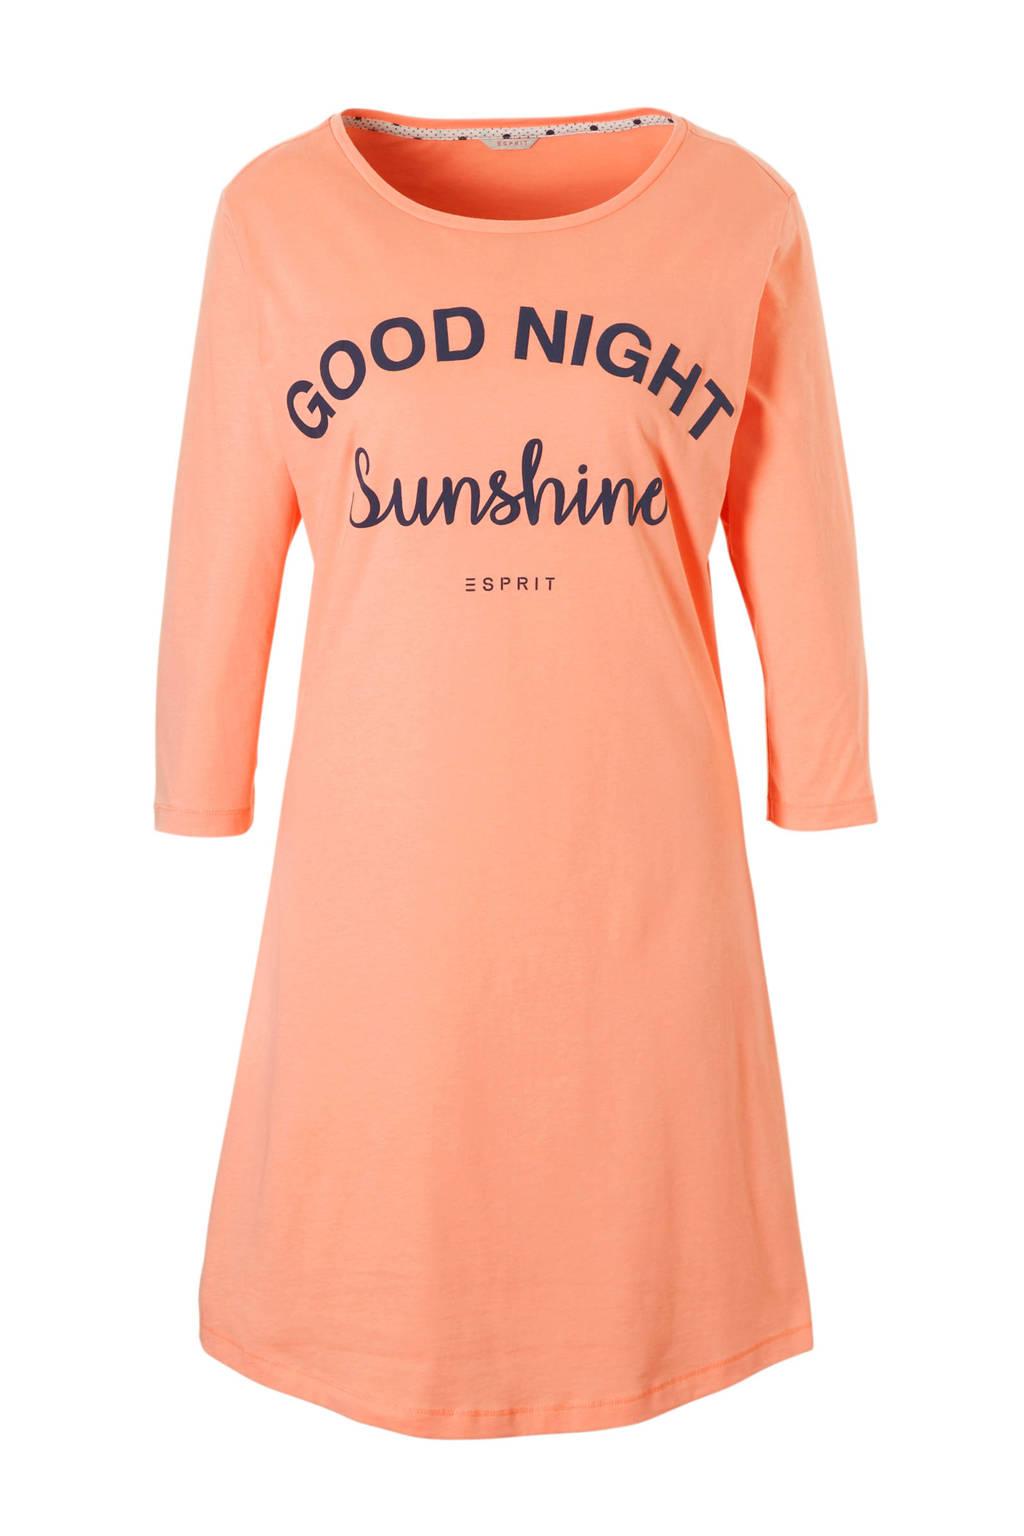 ESPRIT Women Bodywear nachthemd met tekstopdruk zalm, Zalm/antraciet